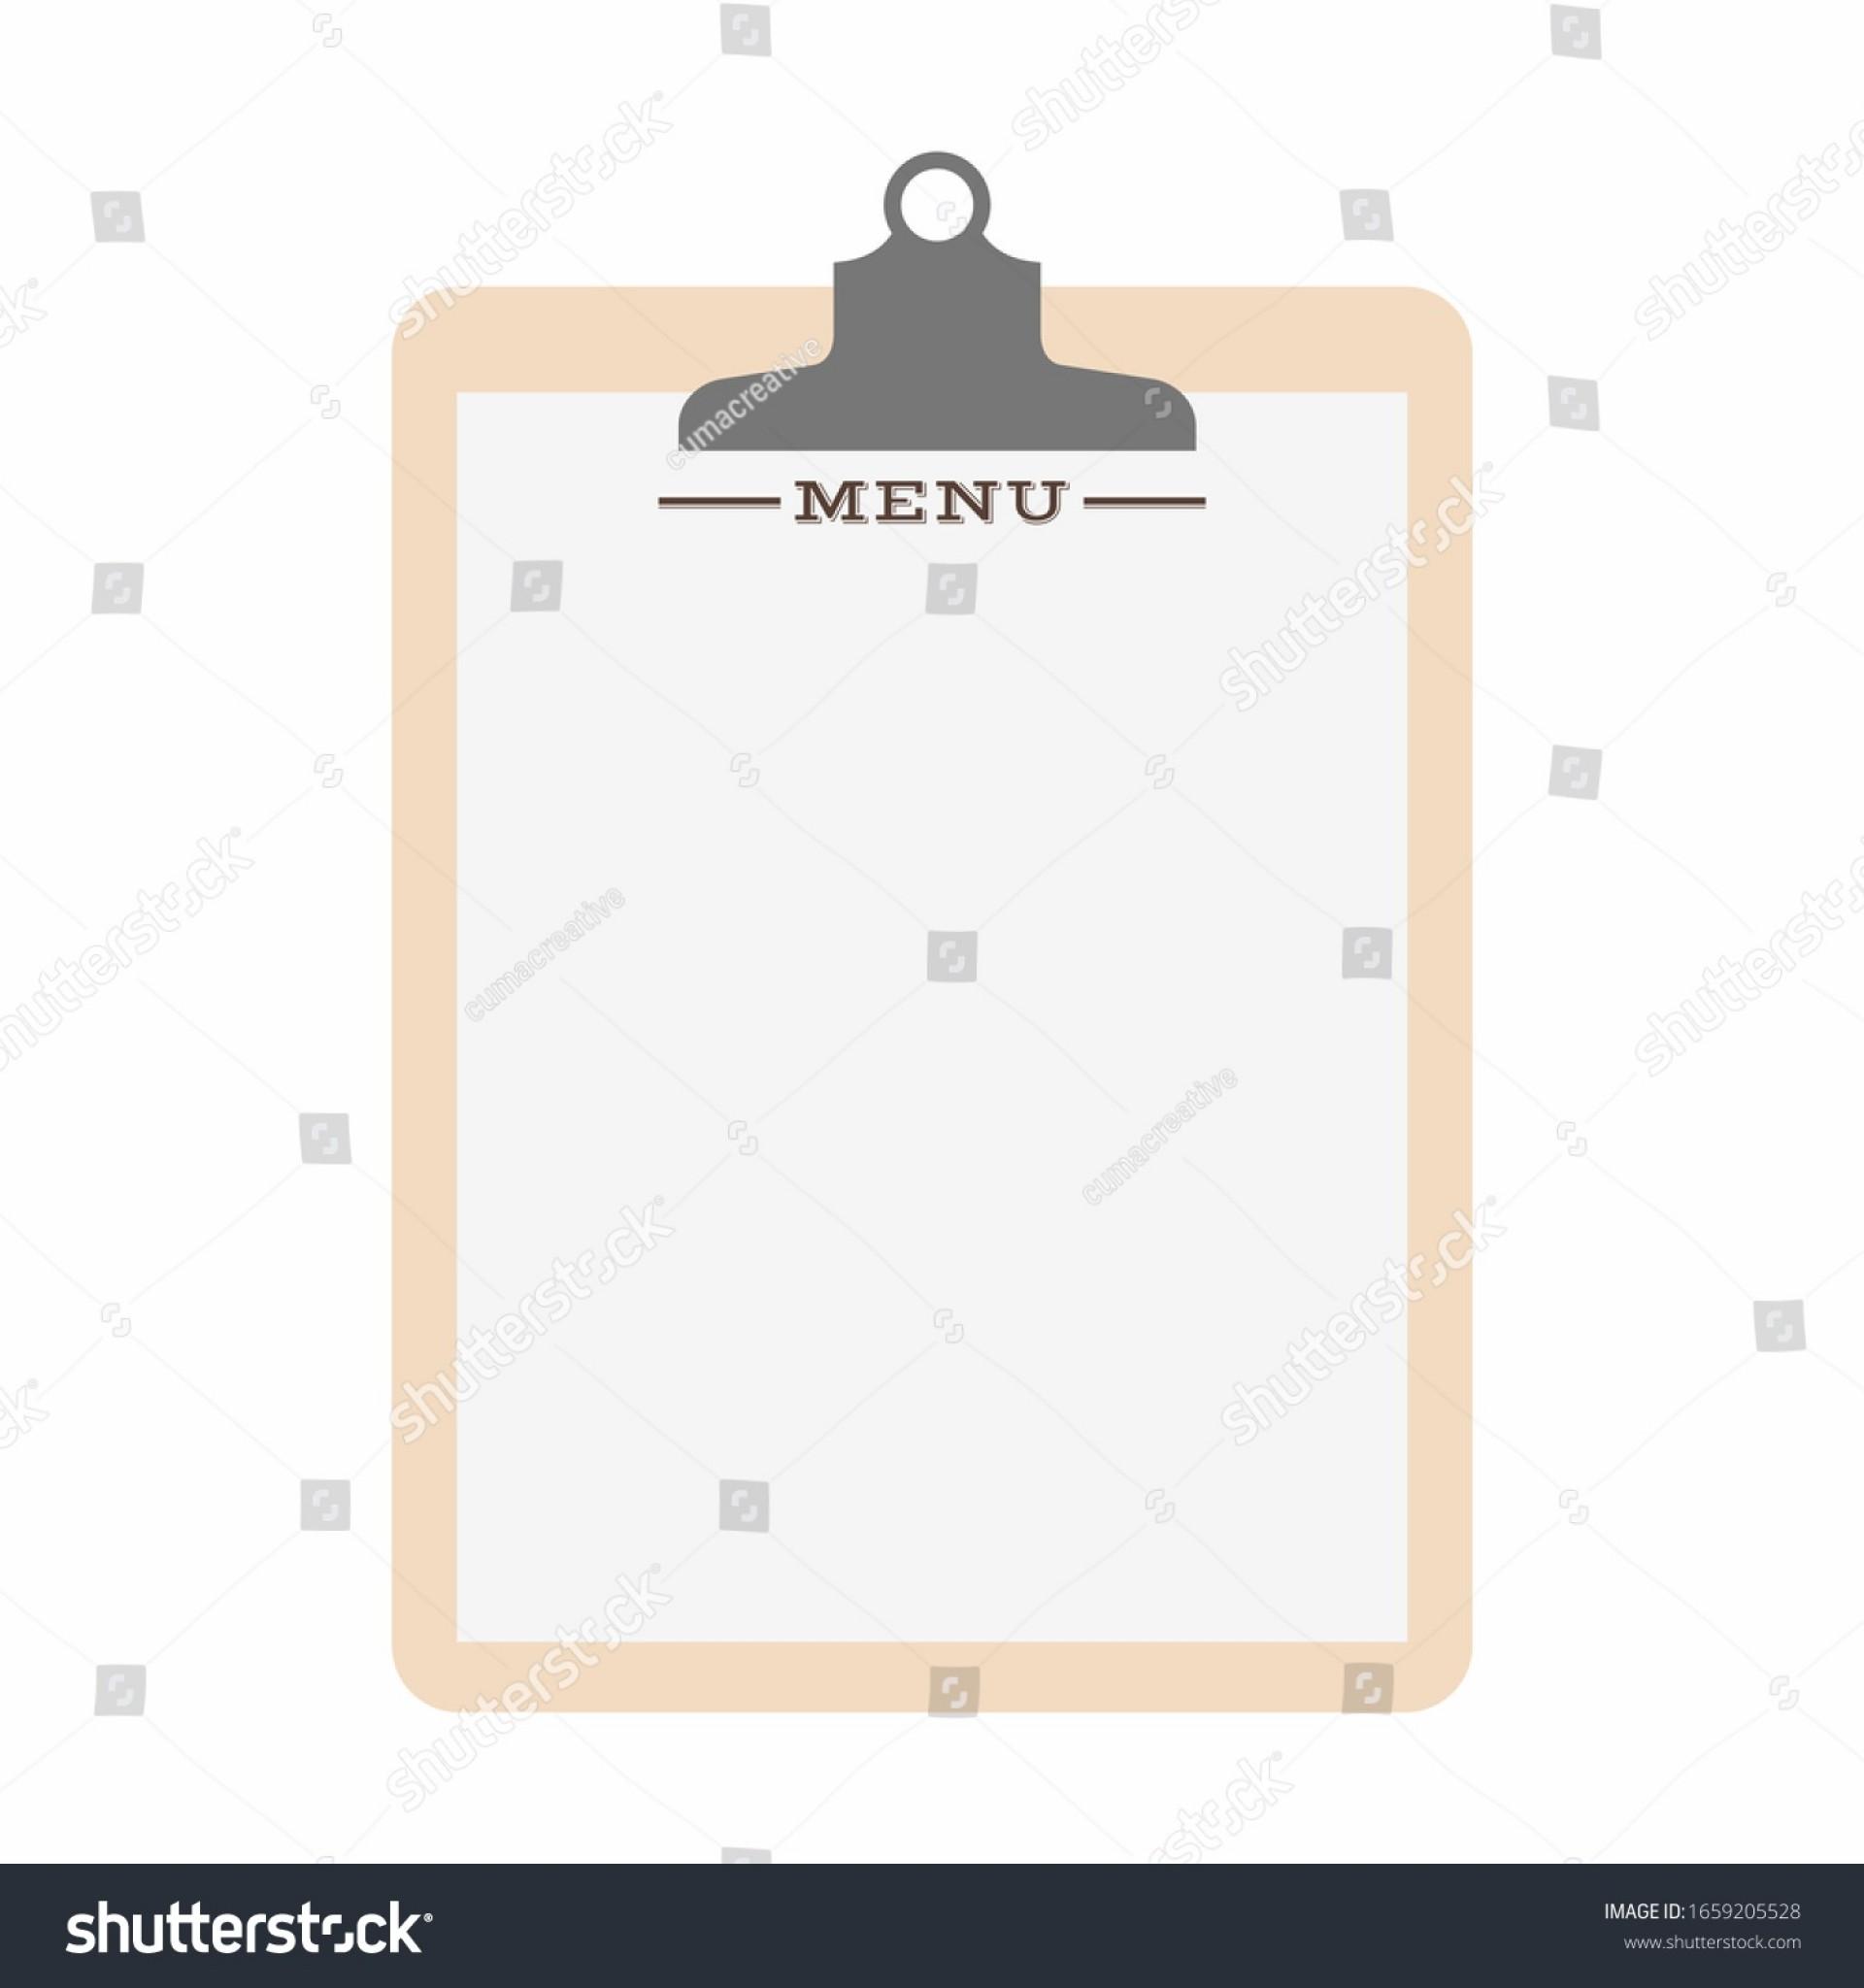 009 Surprising Blank Restaurant Menu Template Inspiration  Free Printable Downloadable1920